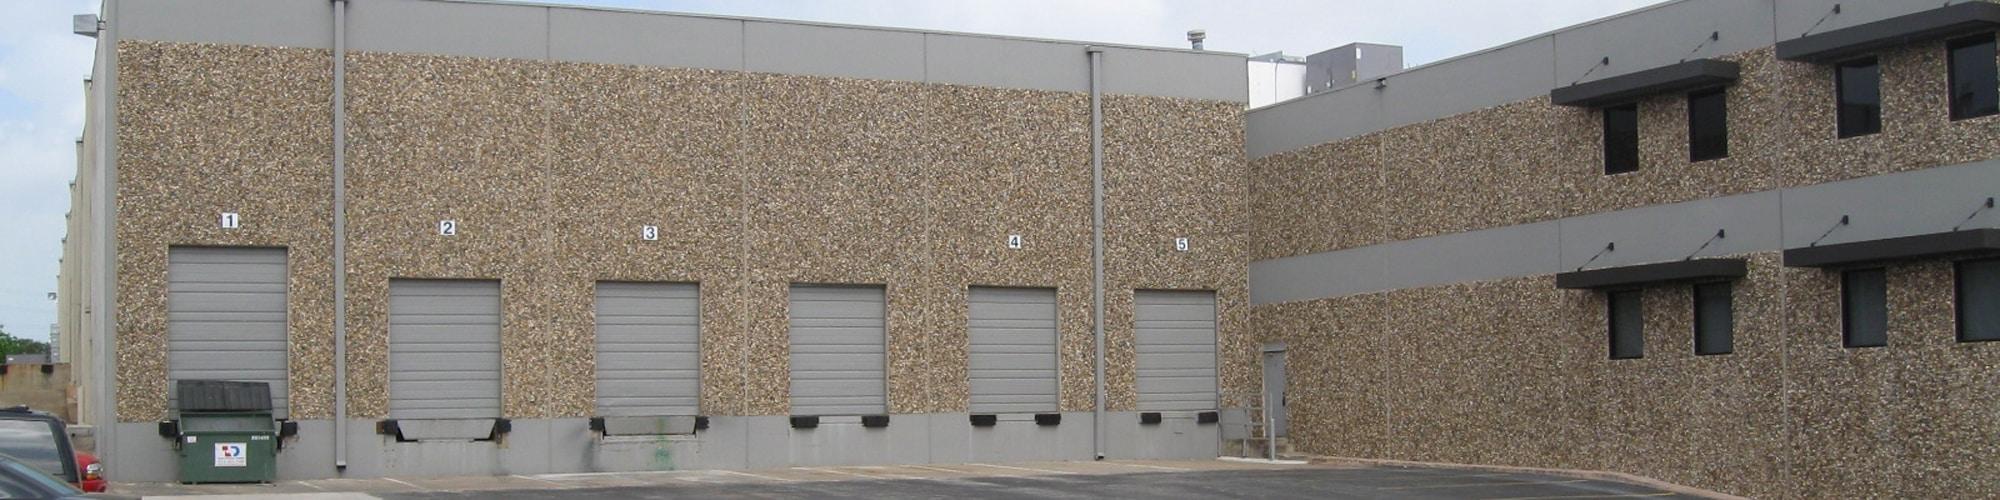 Metric Commerce Center Rear Exterior | 10300 Metric Boulevard in Austin, Texas